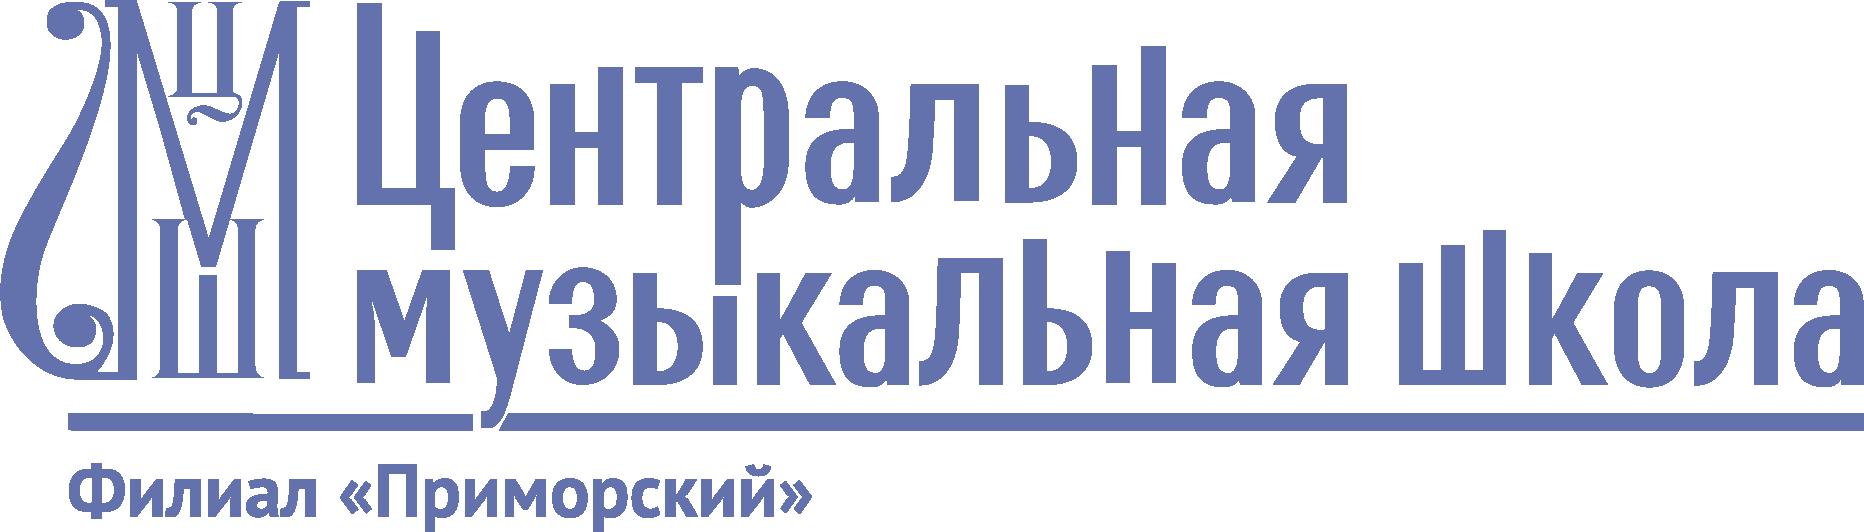 Филиал ПРИМОРСКИЙ ЦМШ